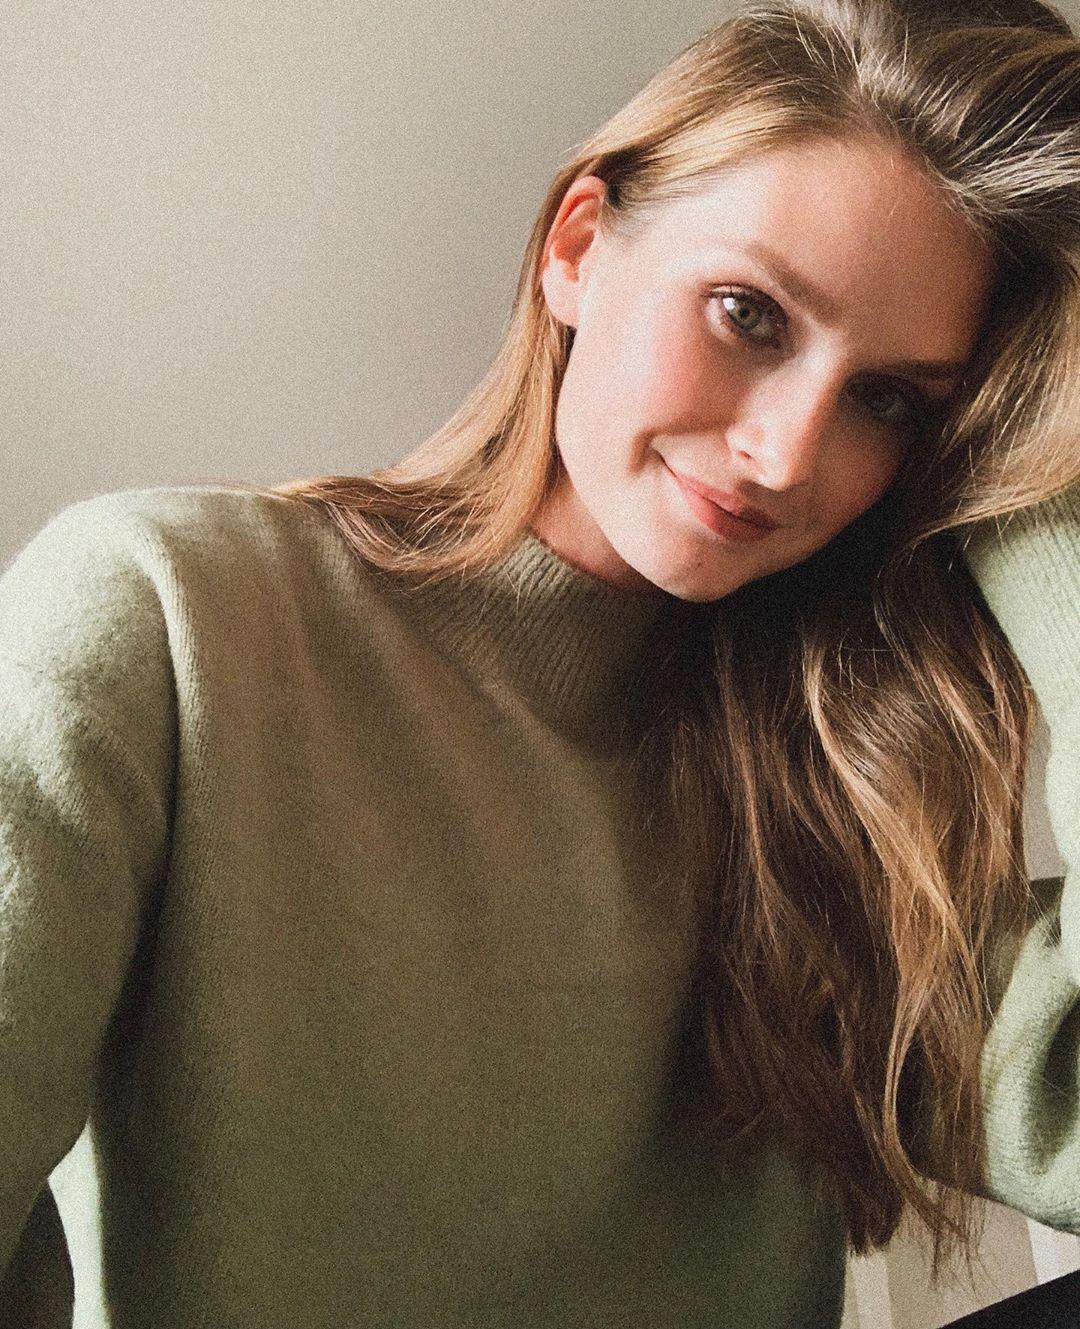 Johanna-Gronholm-Wallpapers-Insta-Fit-Bio-4